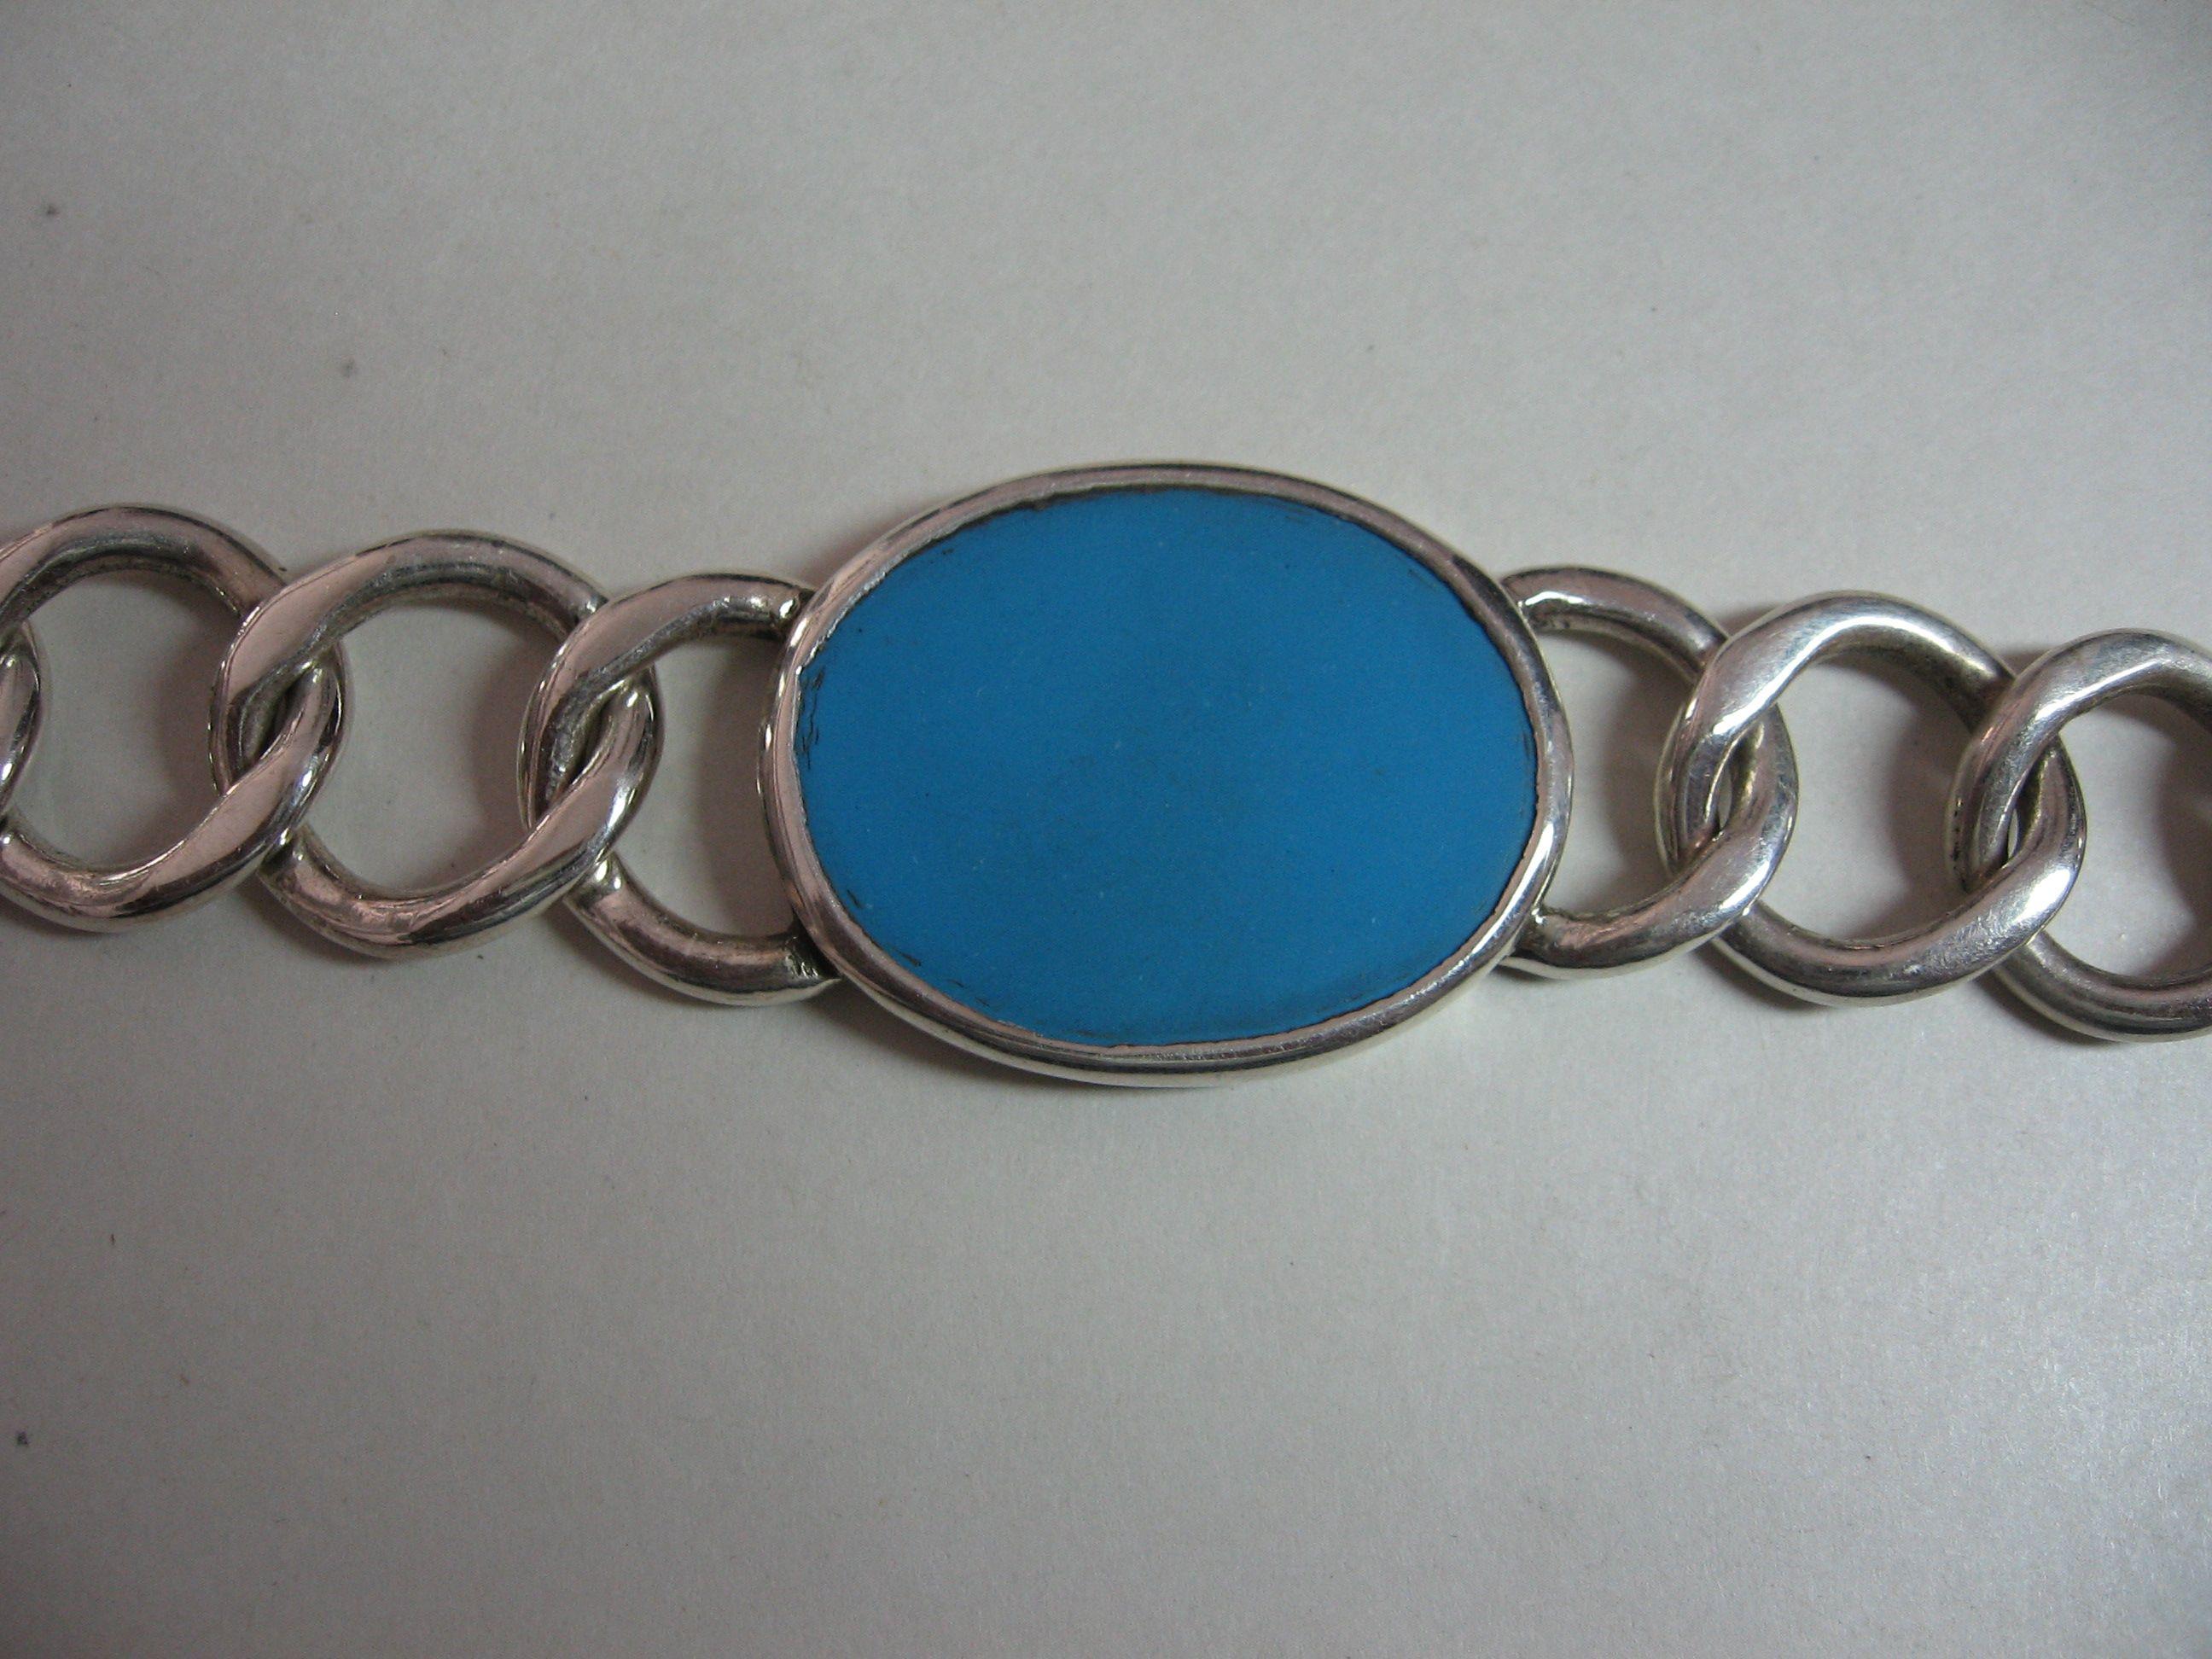 Salman Khan Original Firoza Turquoise Bracelet Buy